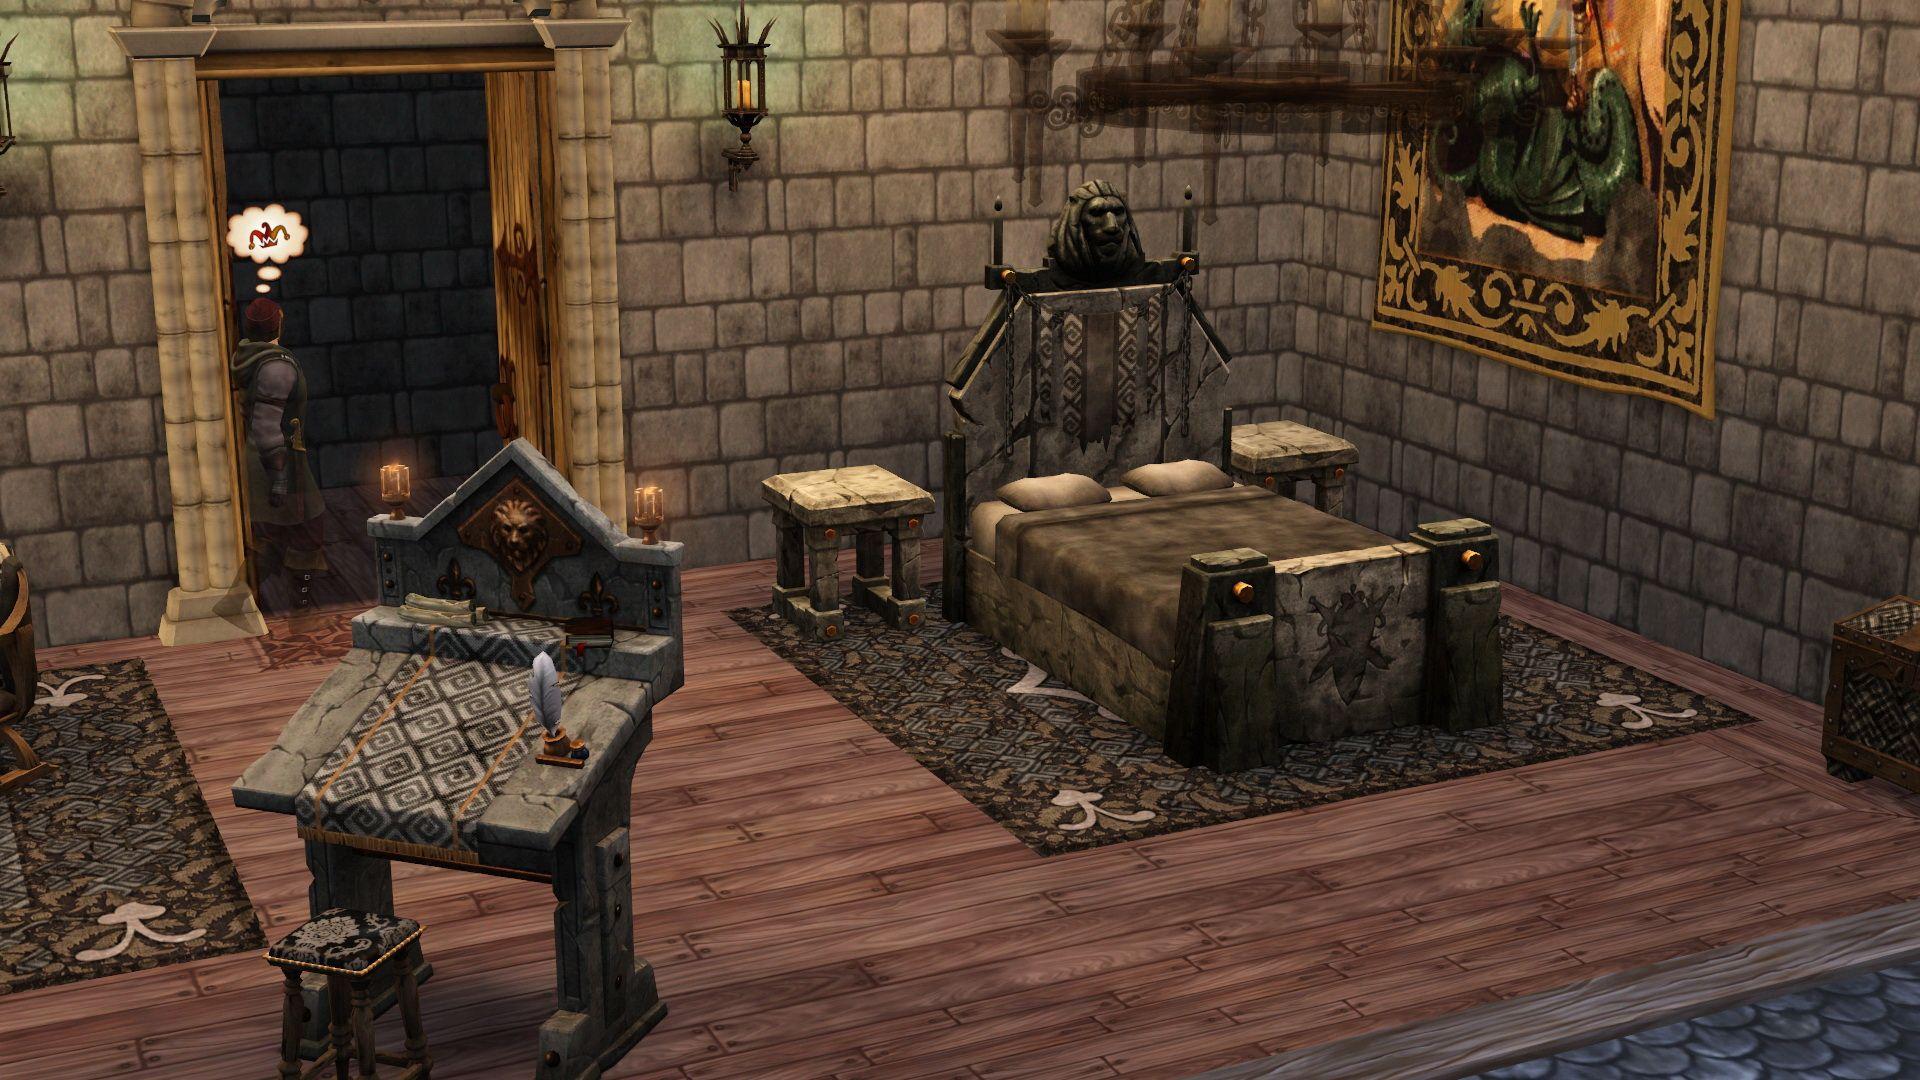 Medieval Room Decor